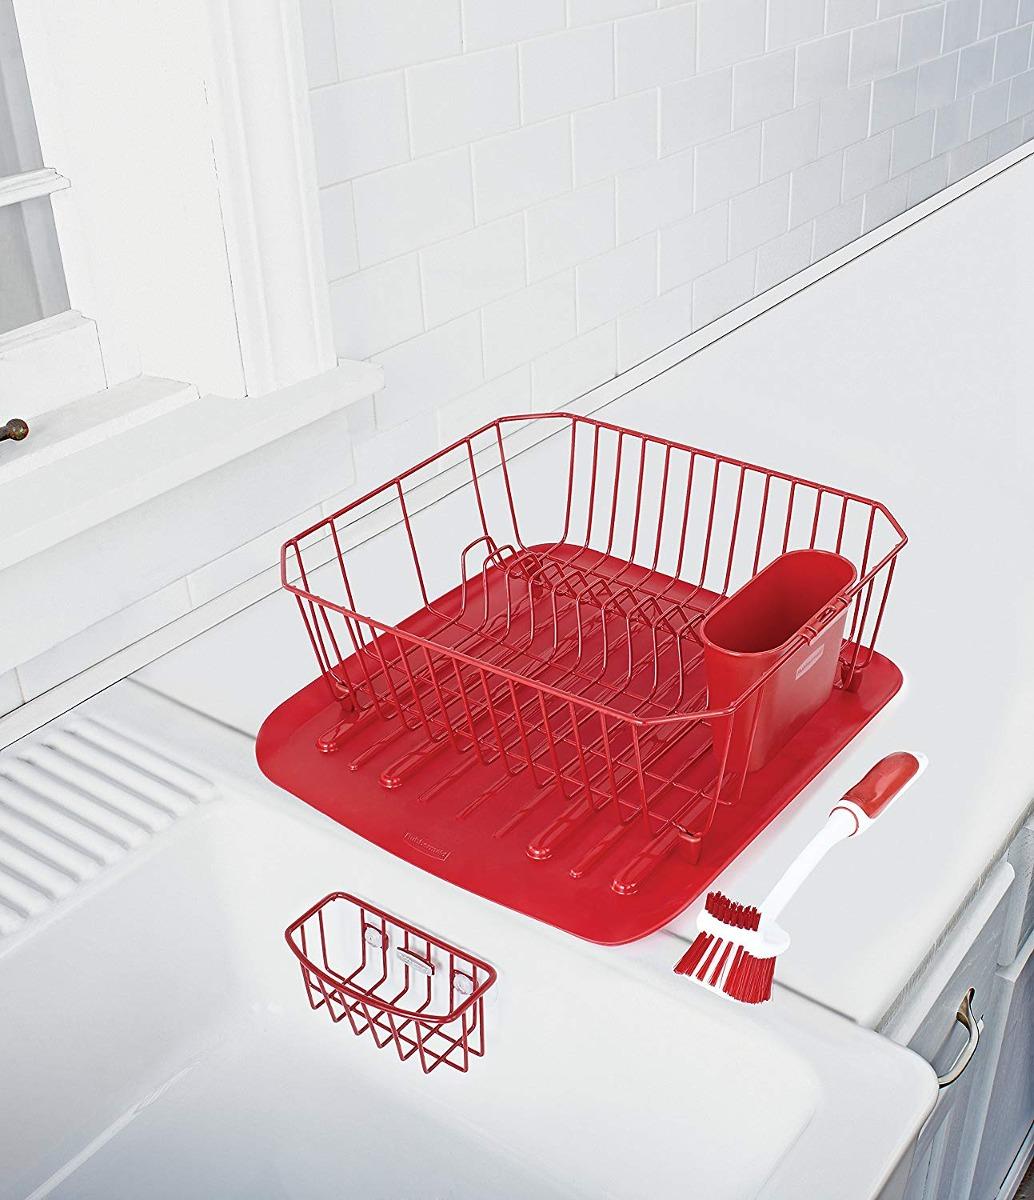 Escurre Platos Antimicrobiana Para Fregadero Rojo Rubbermaid ... 27d7ba24a919